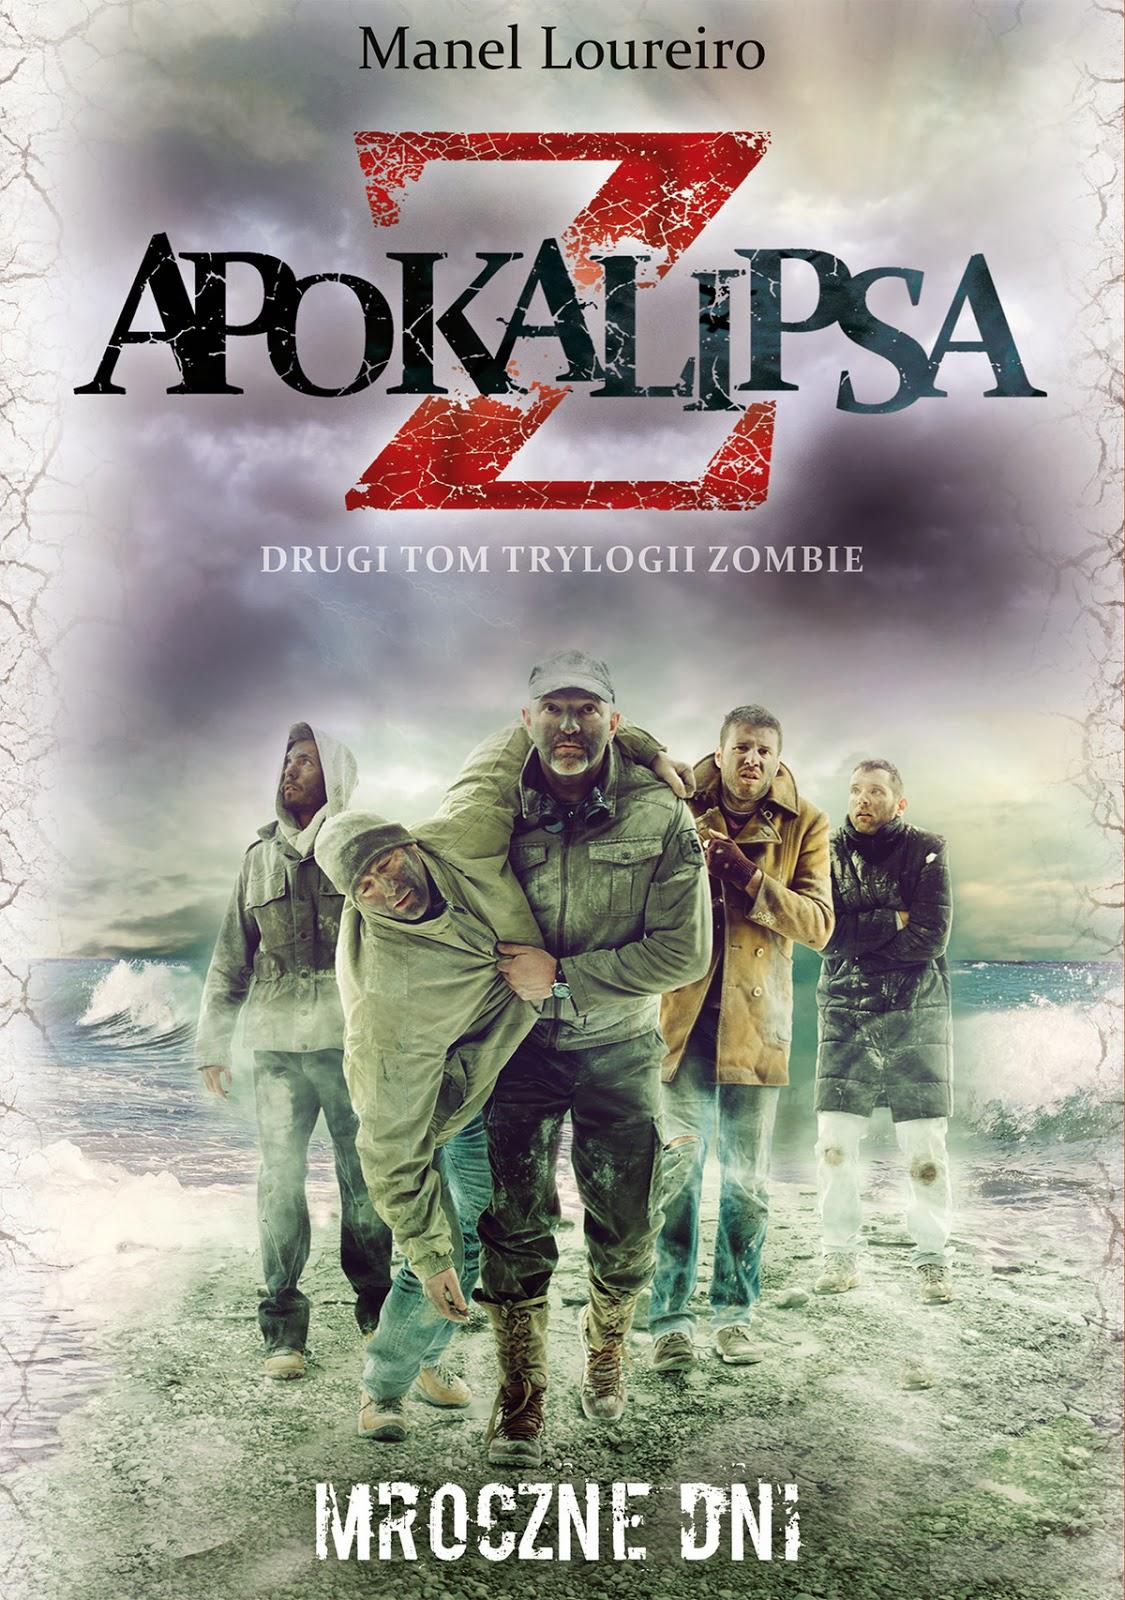 http://muza.com.pl/literatura/1460-apokalipsa-z-mroczne-dni-t2-9788377584996.html